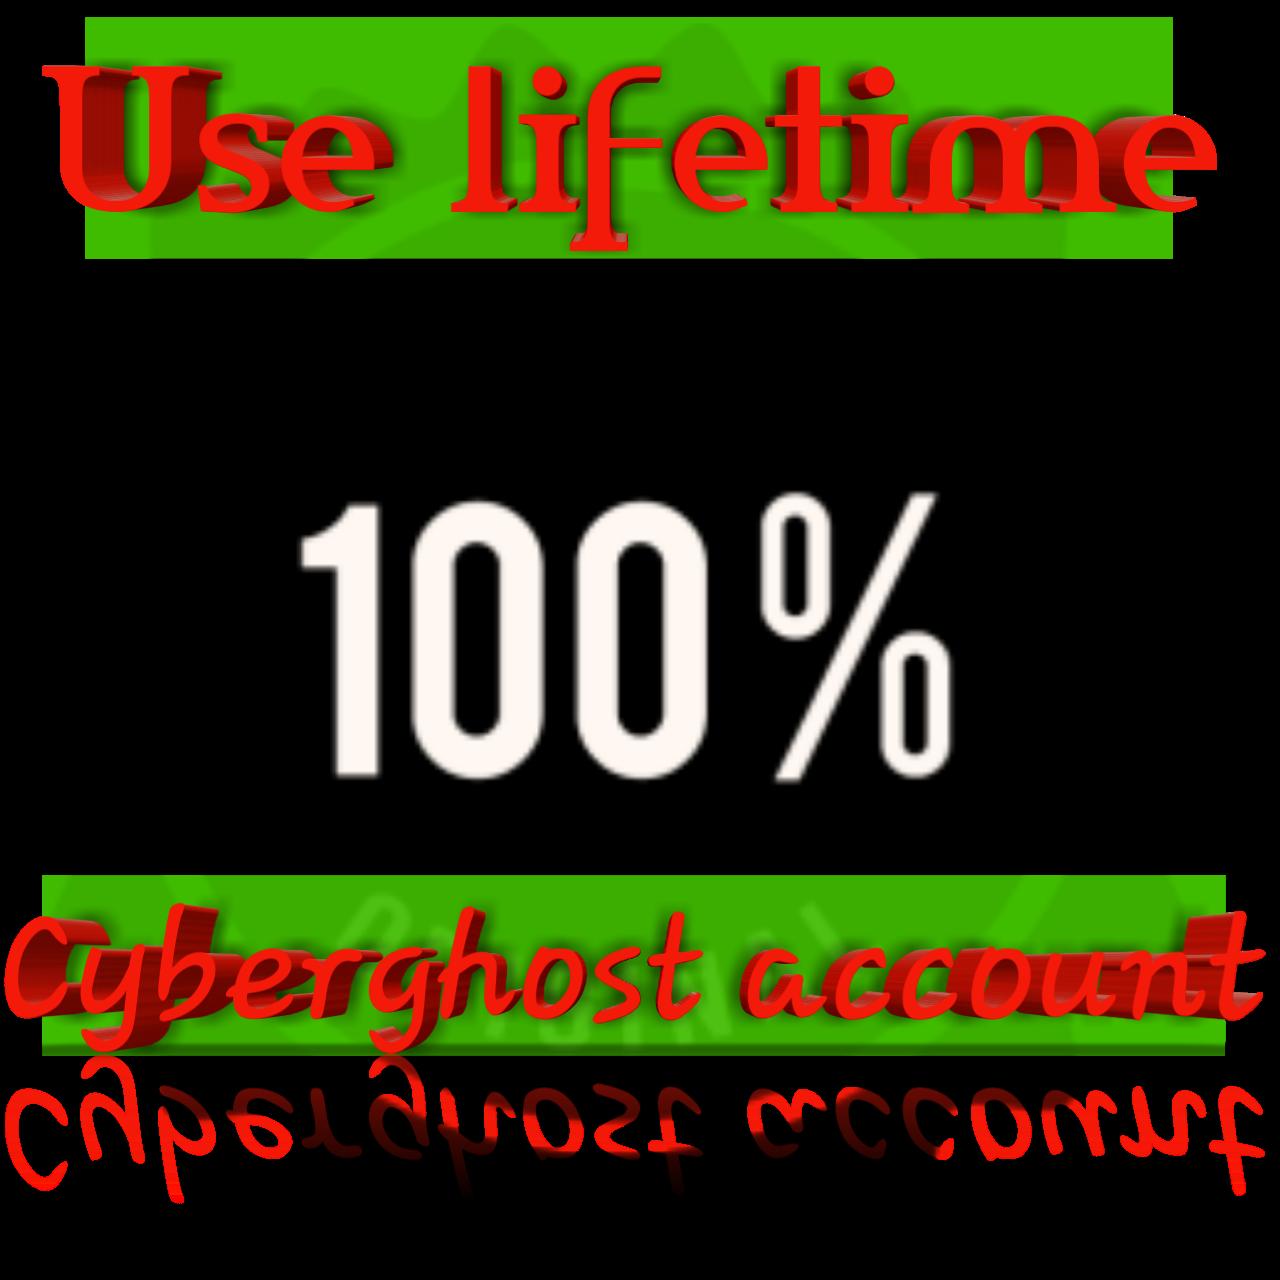 How to create unlimited cyberghost account and use free lifetime    কিভাবে সাইবার গোষ্ট ভিপিএন সারাজীবন ফ্রী ব্যবহার করবেন